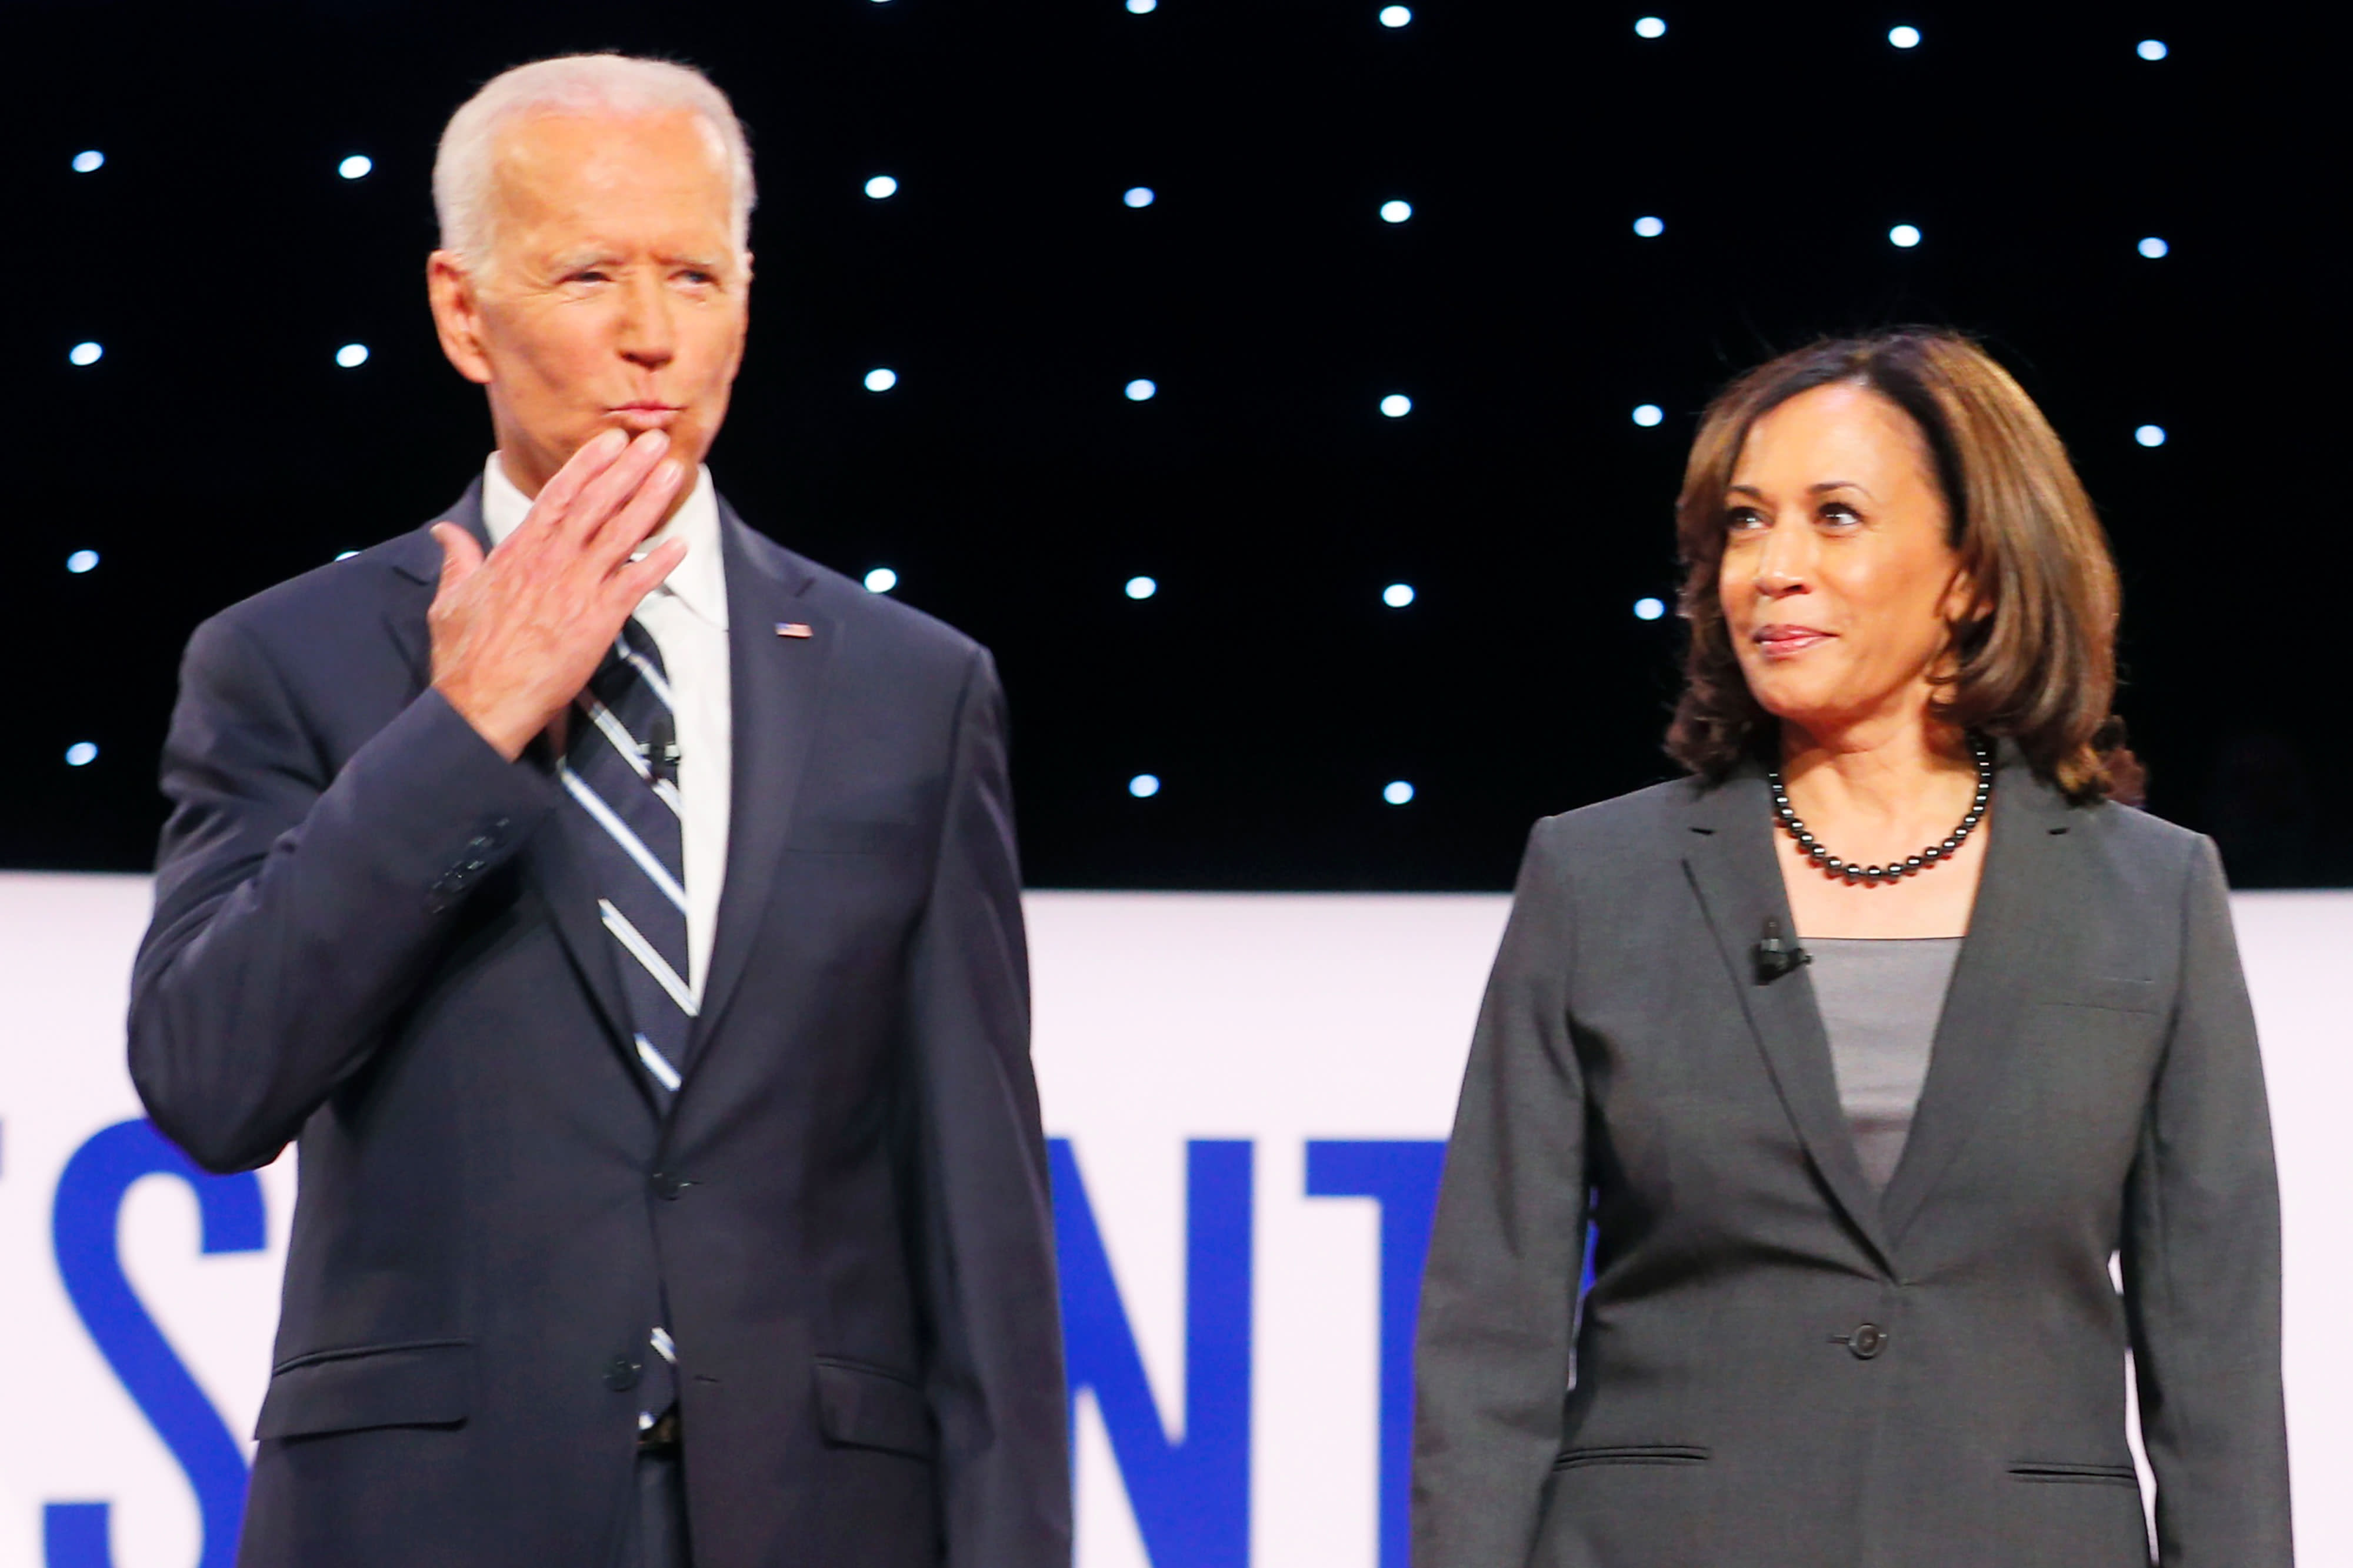 Joe Biden holds his big lead, and Kamala Harris slides: Here are the latest 2020 Democratic primary polls